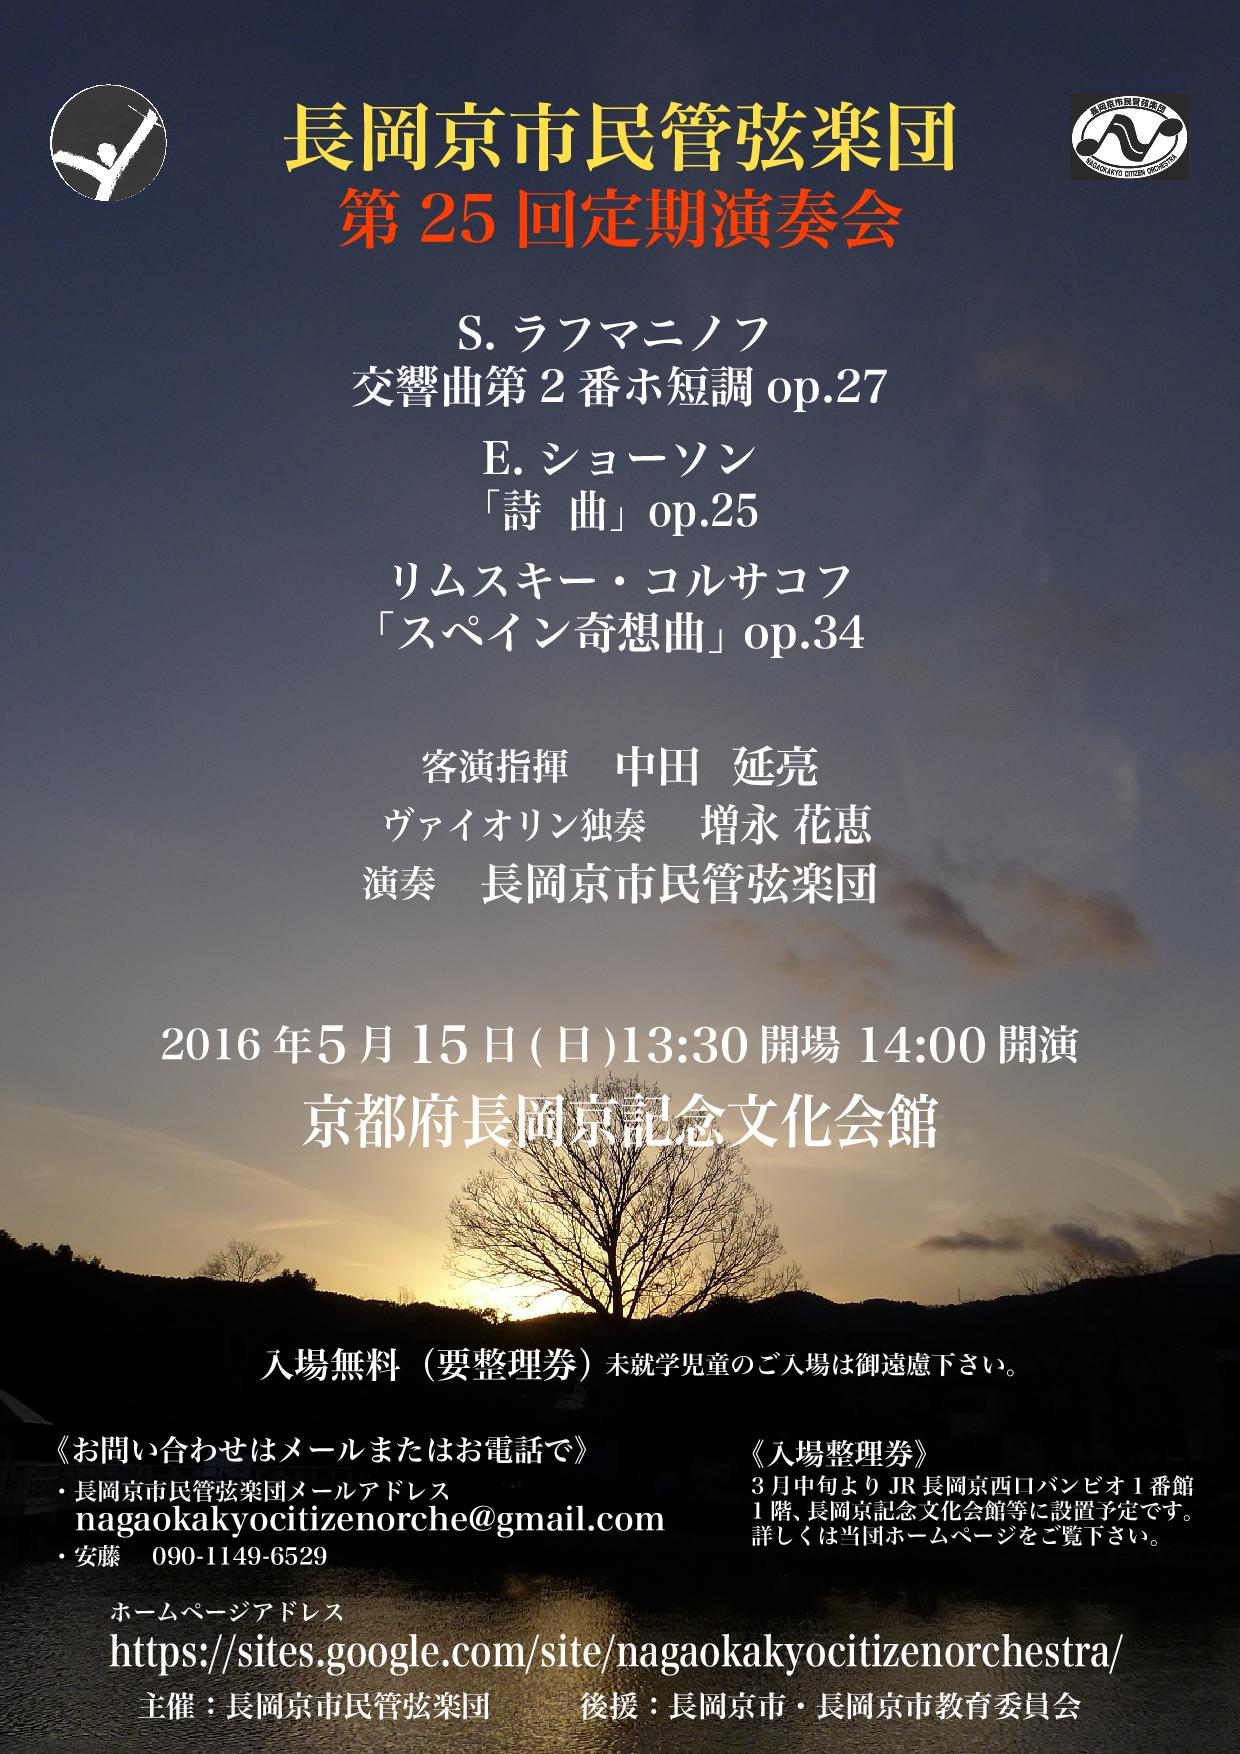 http://www.nobuakinakata.com/25%E5%9B%9E-1.jpg